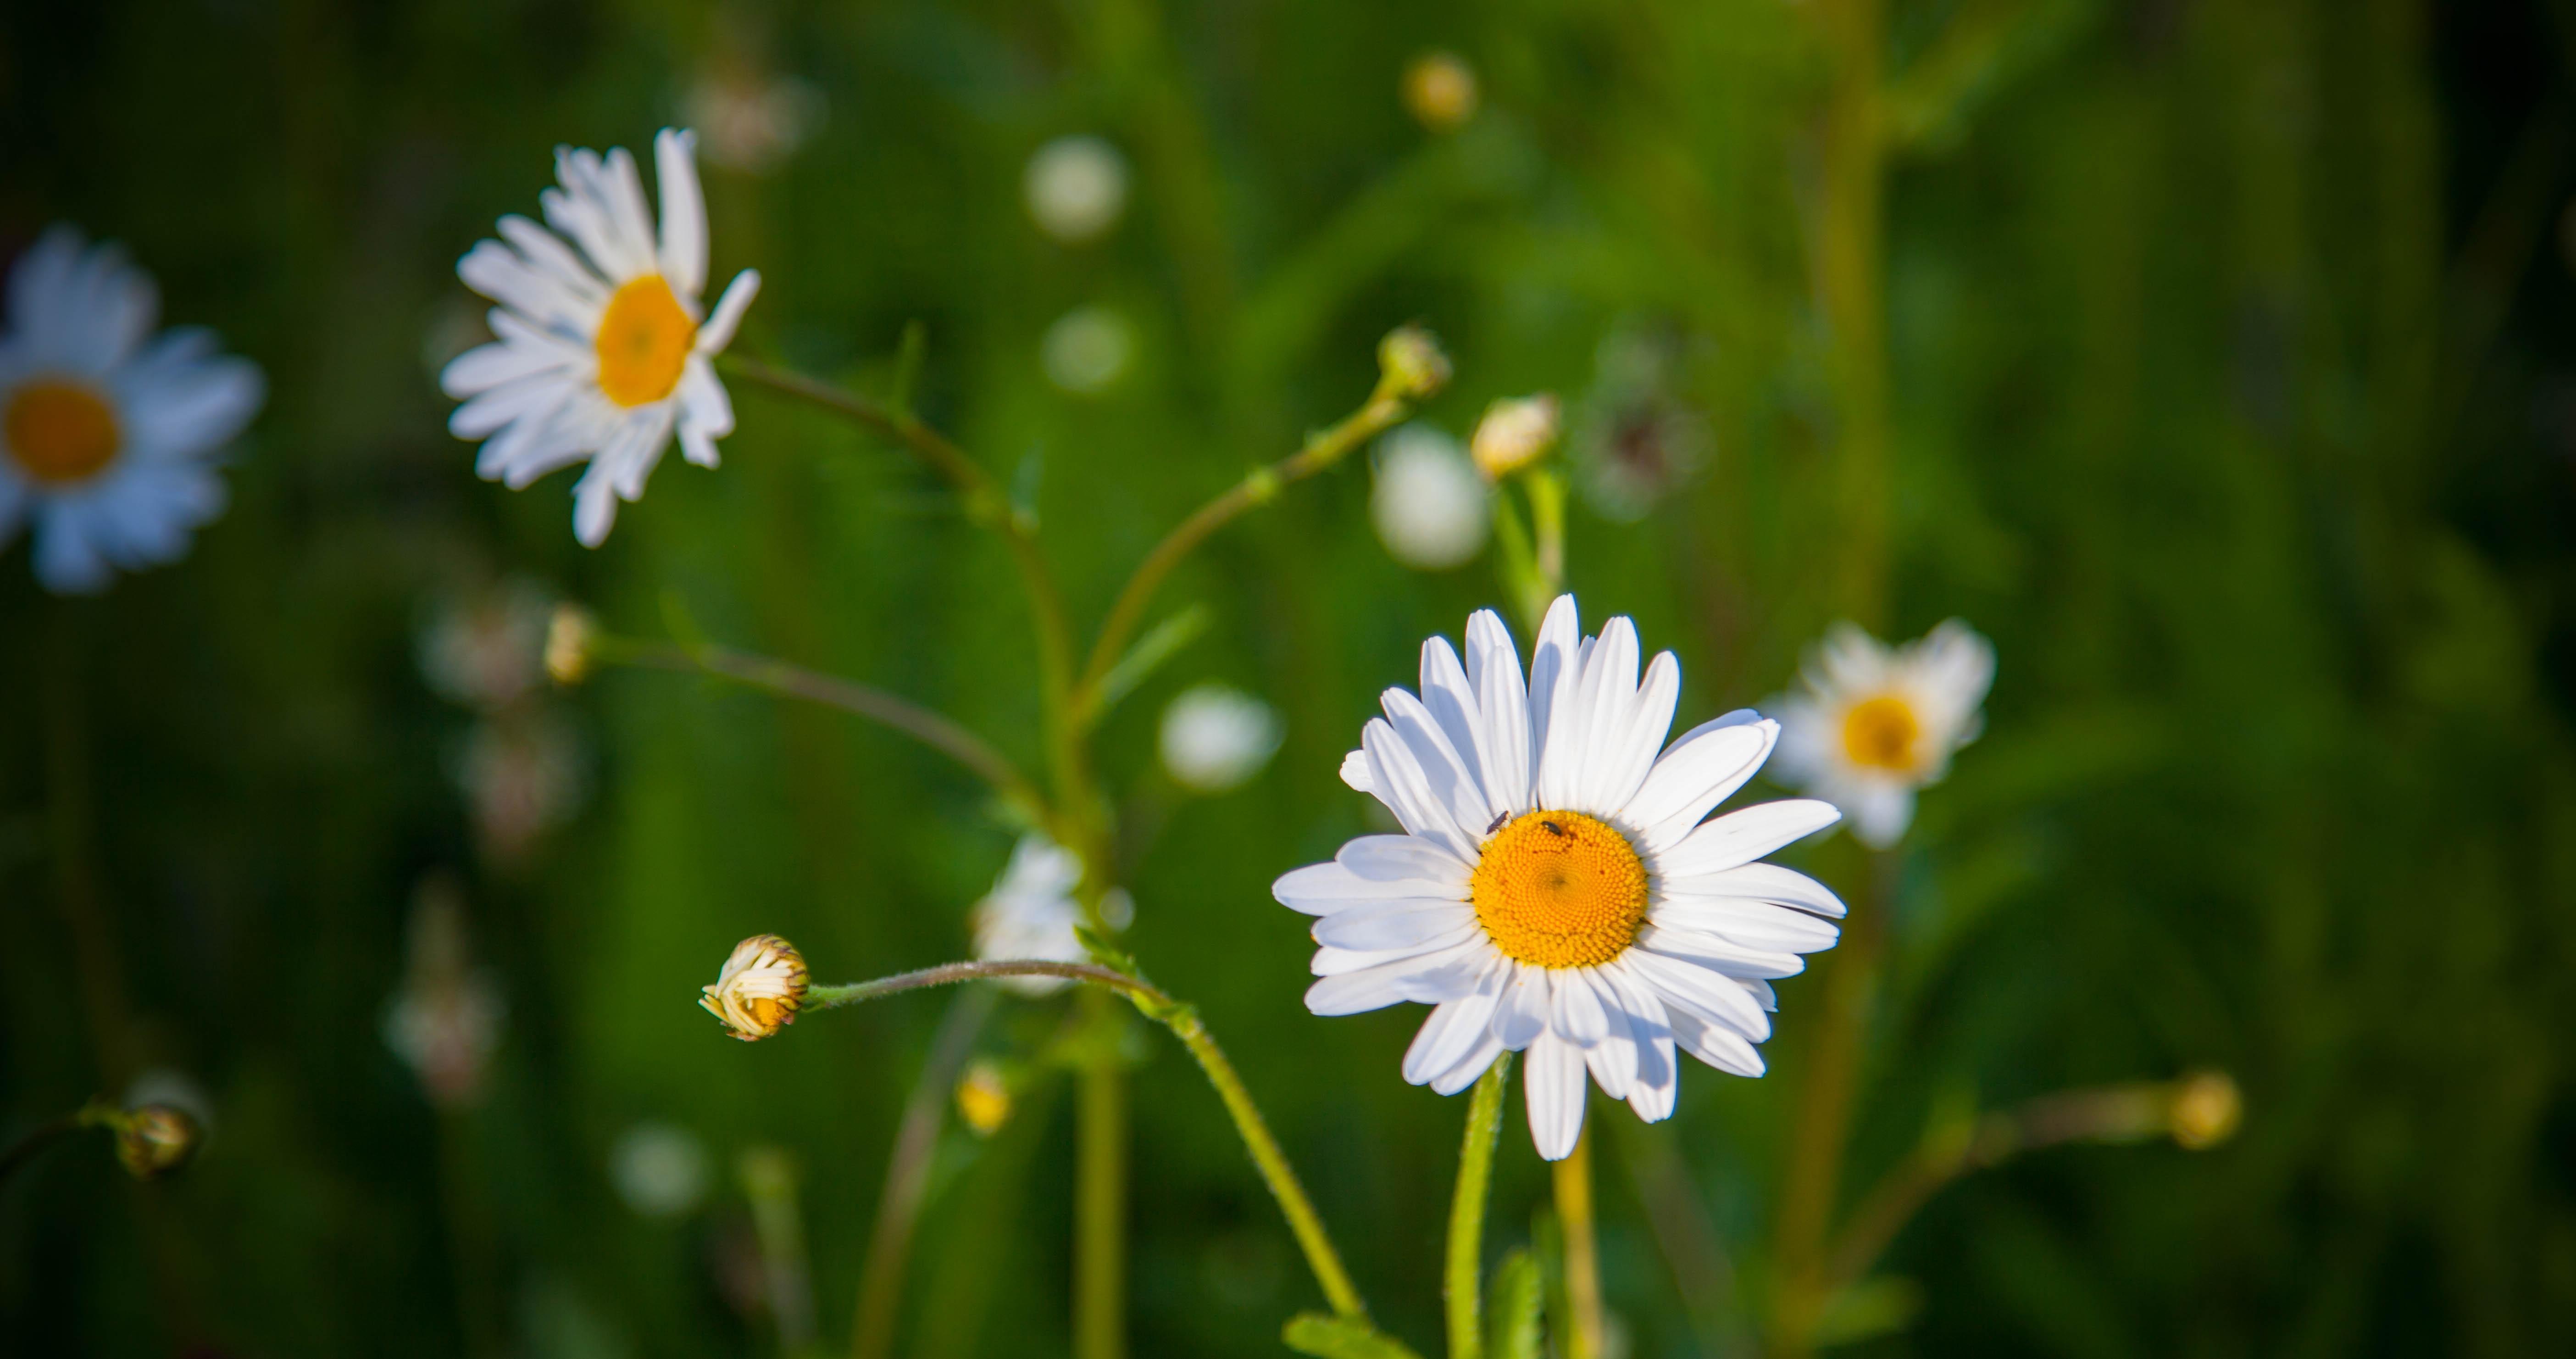 Fotos gratis : naturaleza, césped, blanco, campo, vendimia, prado ...